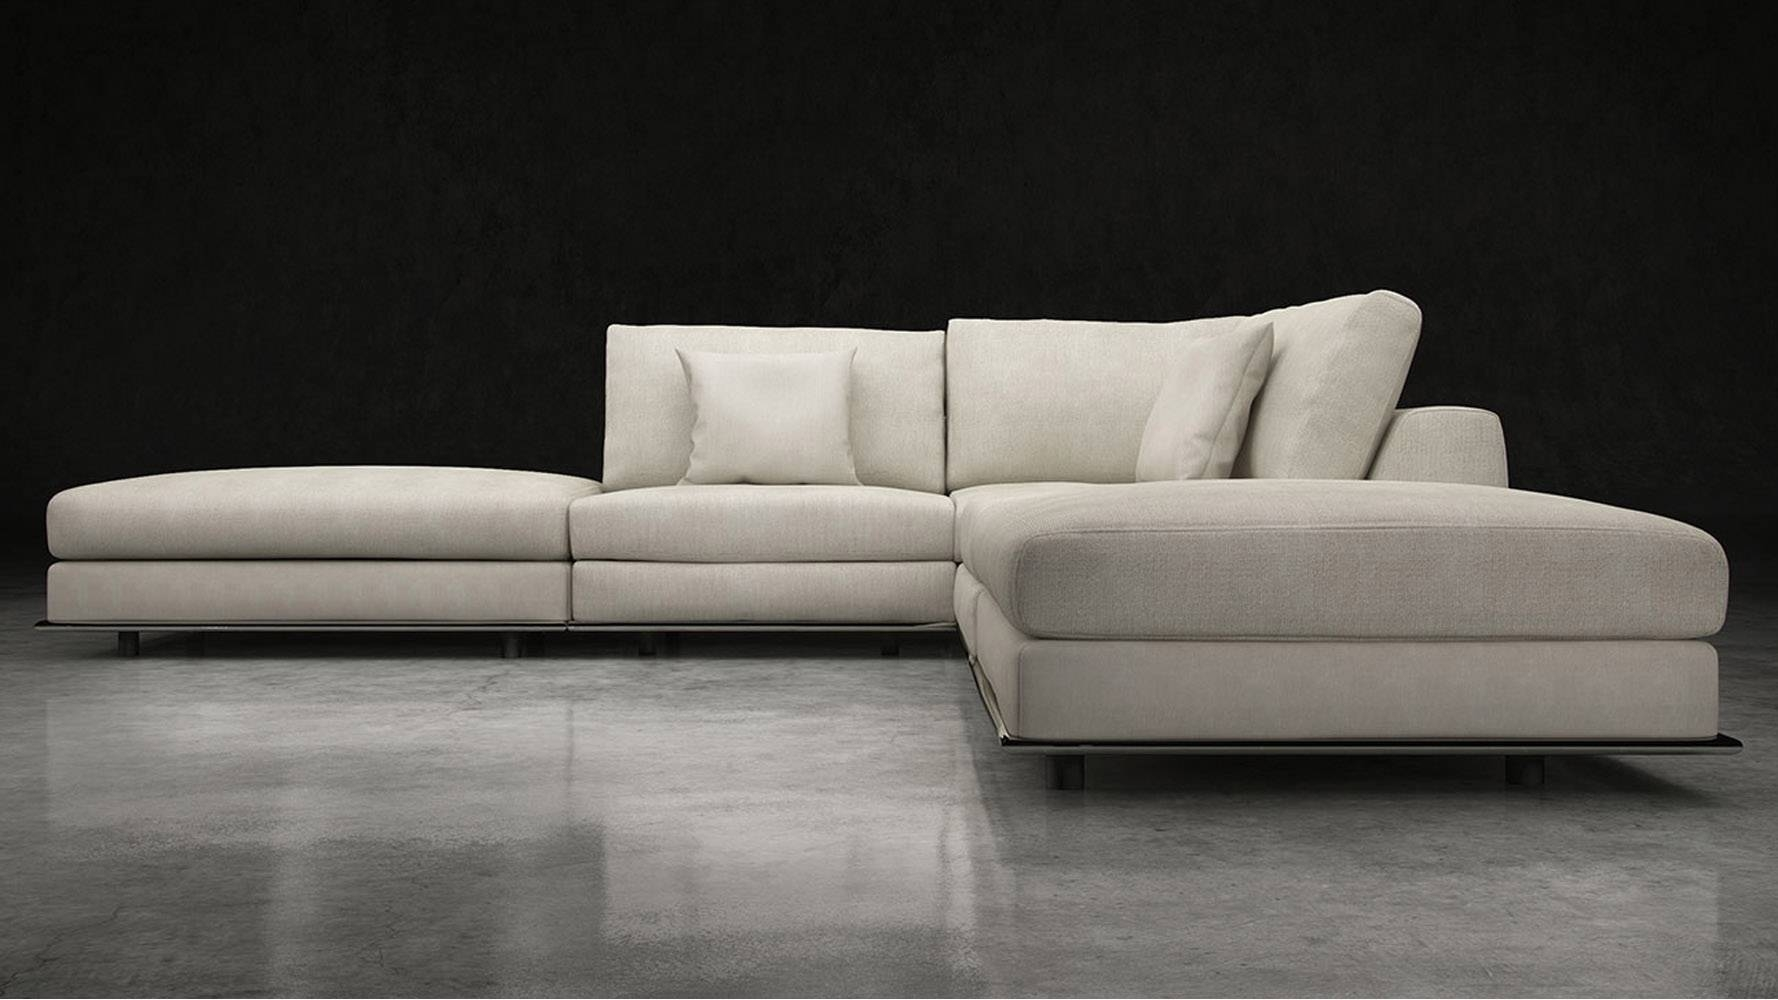 Modern Persis Armless Corner Sectional Sofa - Moonbeam | Zuri in Armless Sectional Sofa (Image 17 of 30)